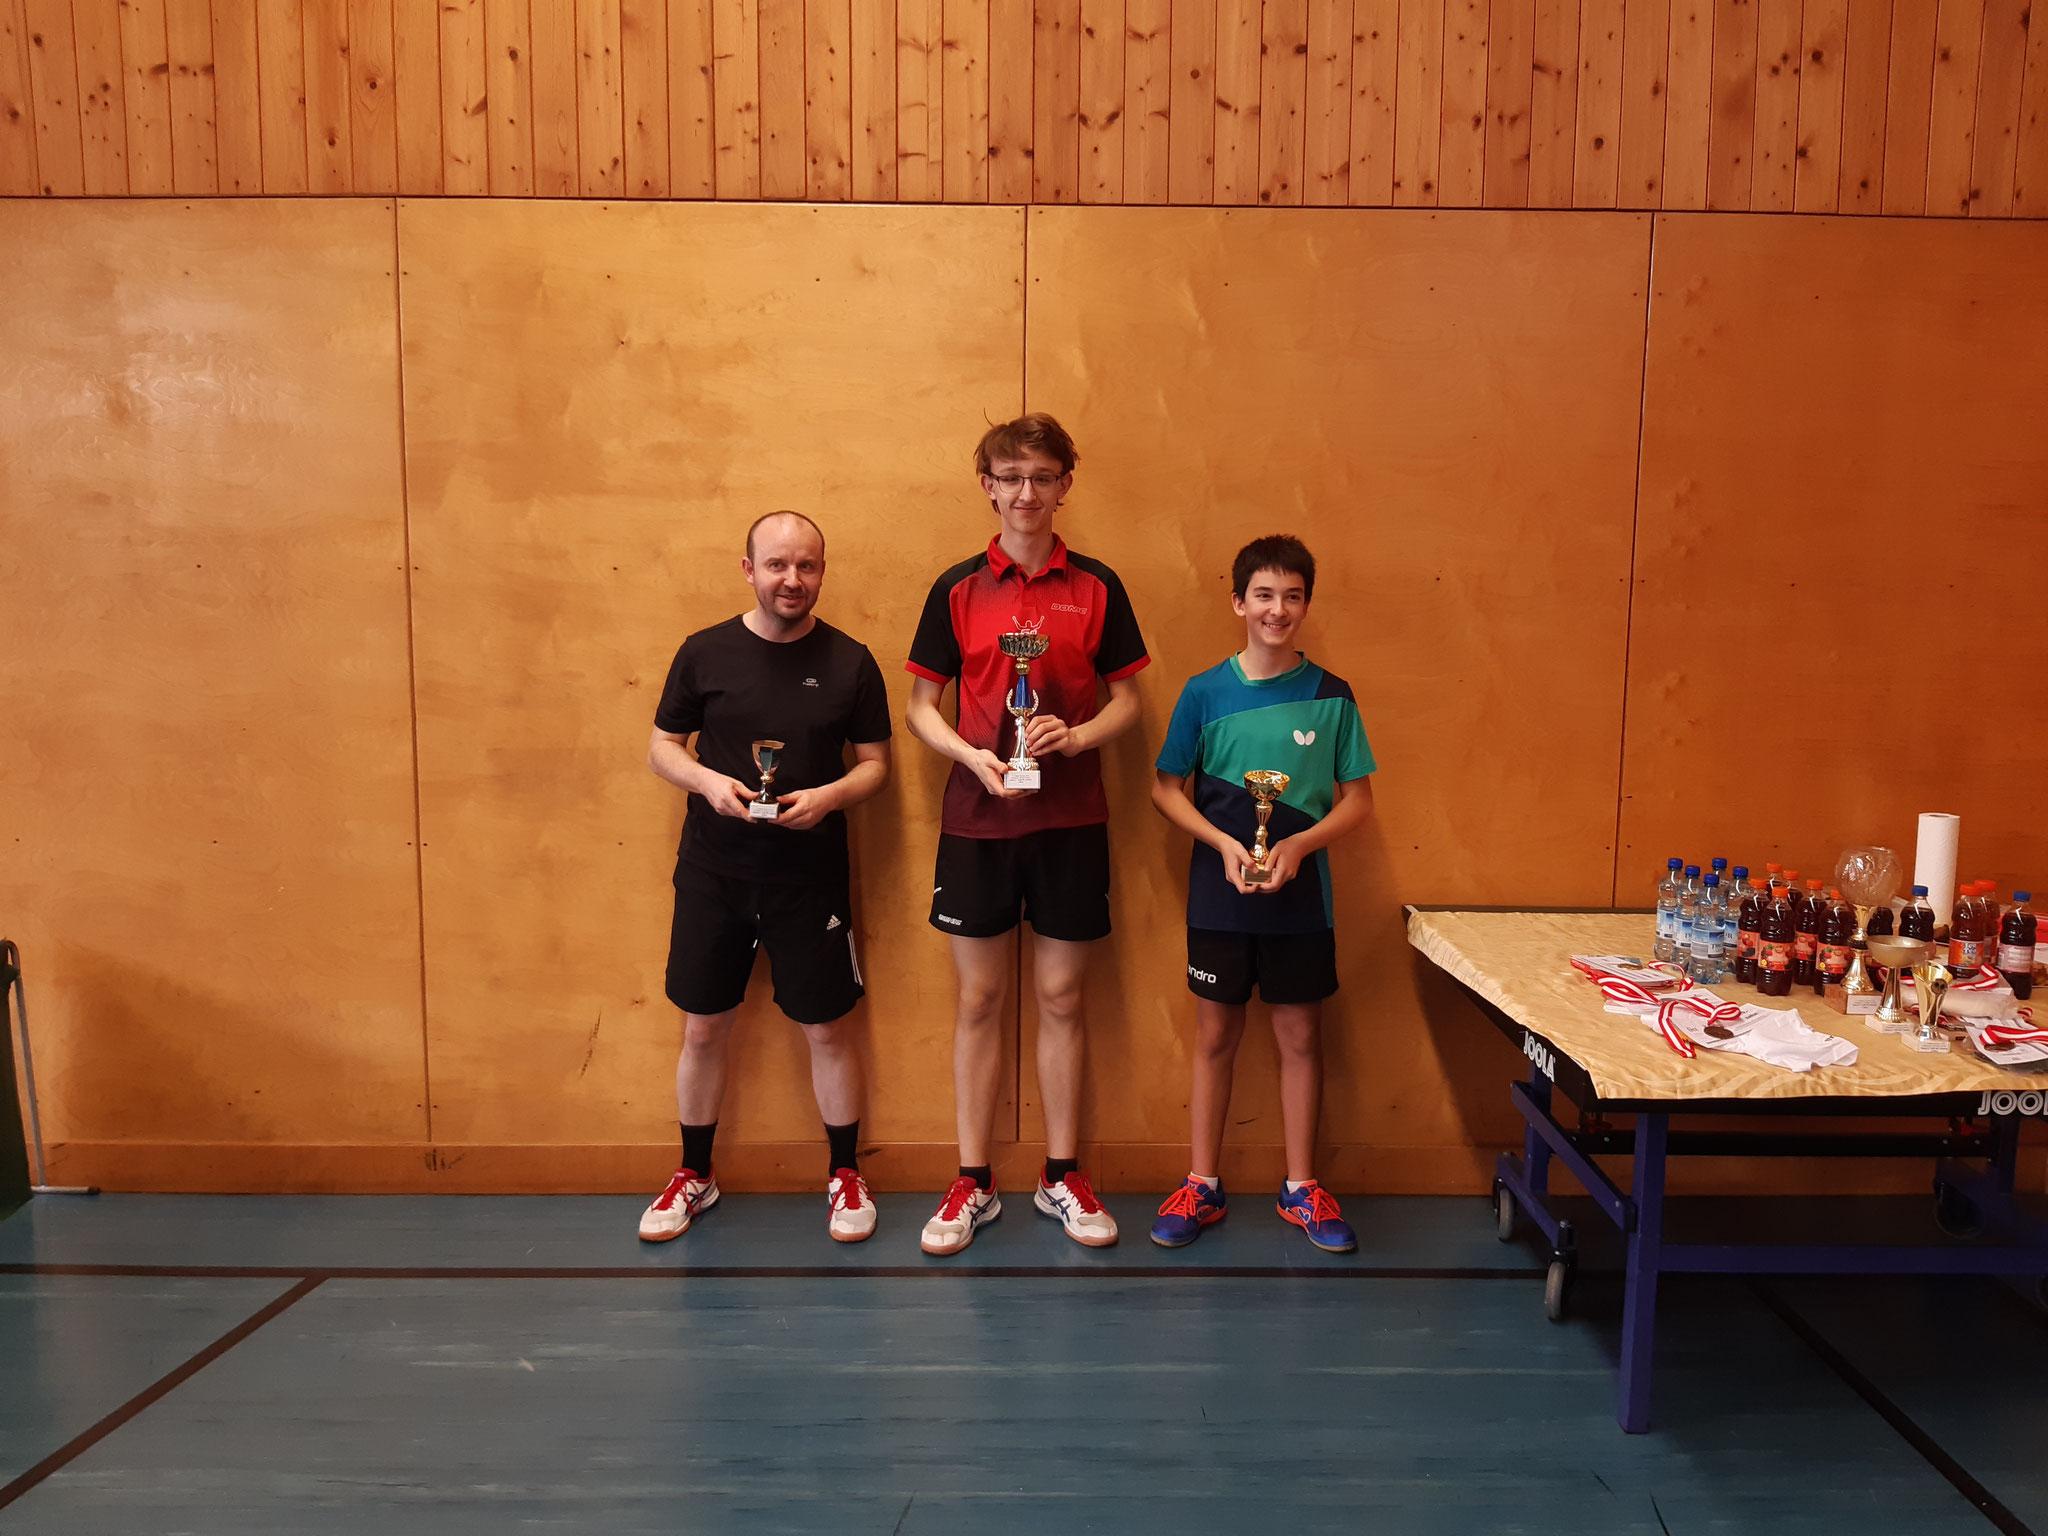 Siegerfoto Bewerb C: v.l.n.r. Pawel Piotr Galek (LENZ) (Platz 3), Felix Kampas (LENZ) (Sieger), Niklas Damm (SSTO) (Platz 2)